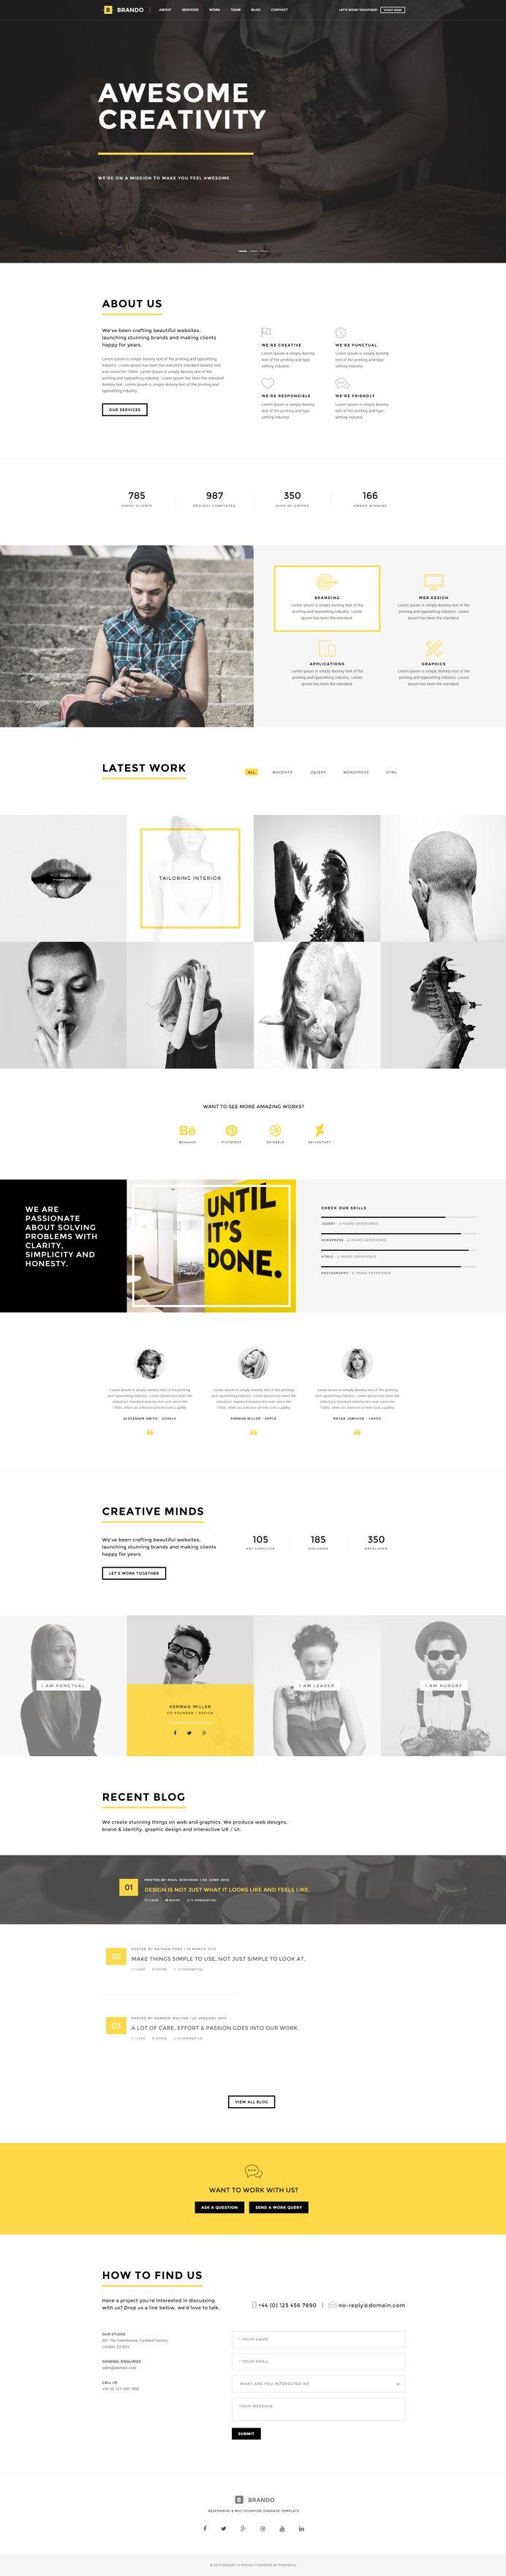 Brando #Responsive & #Multipurpose #OnePage #Template For #Agency by #ThemeZaa http://goo.gl/VGP5GC